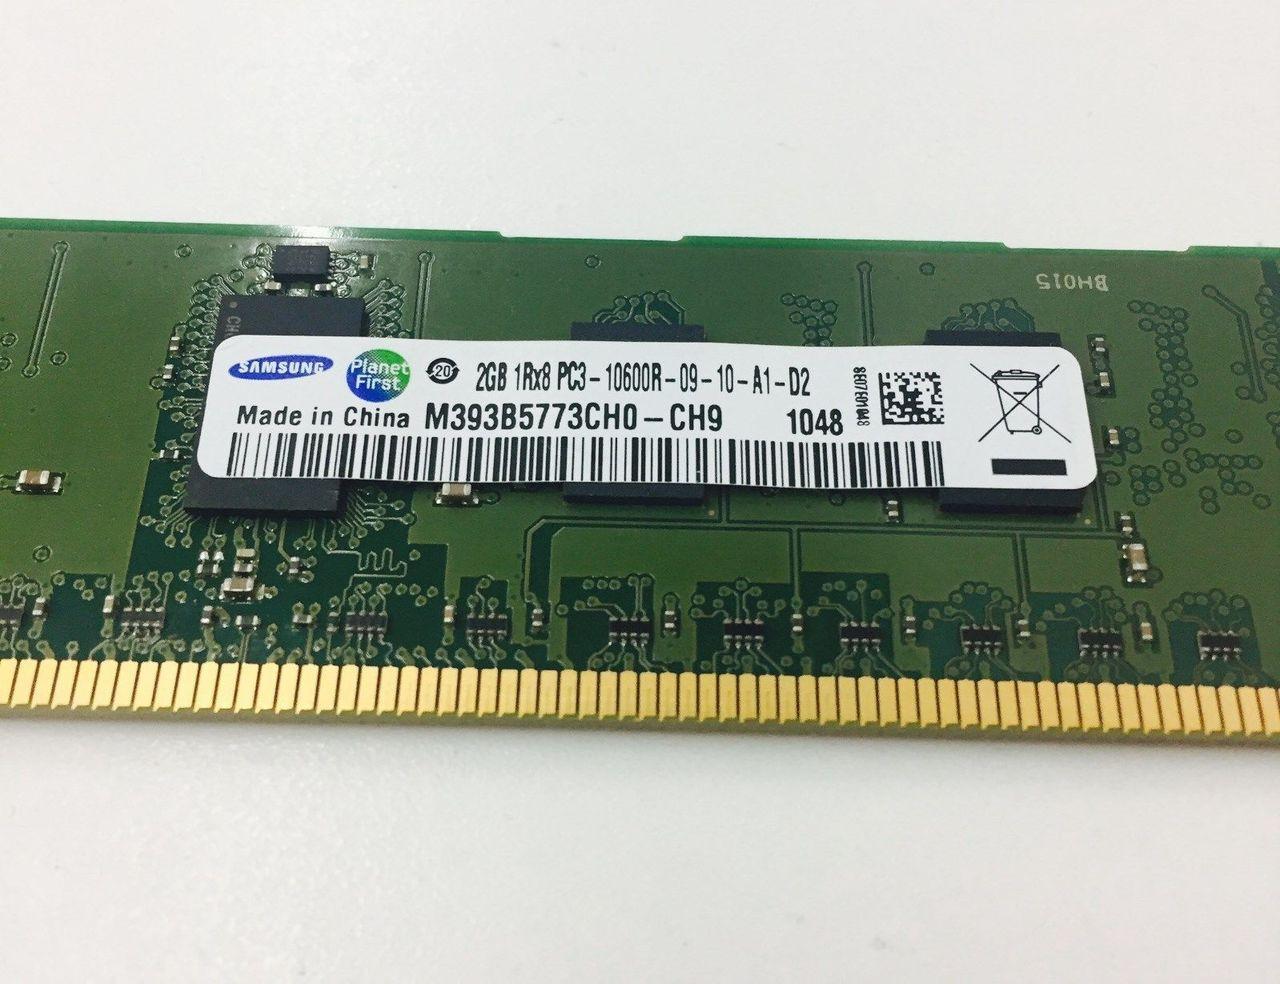 SAMSUNG M393B5773CH0-YH9 2GB SERVER DIMM DDR3 PC10600(1333) REG ECC 1.35v 1RX8 240P 256MX64 256mX8 C